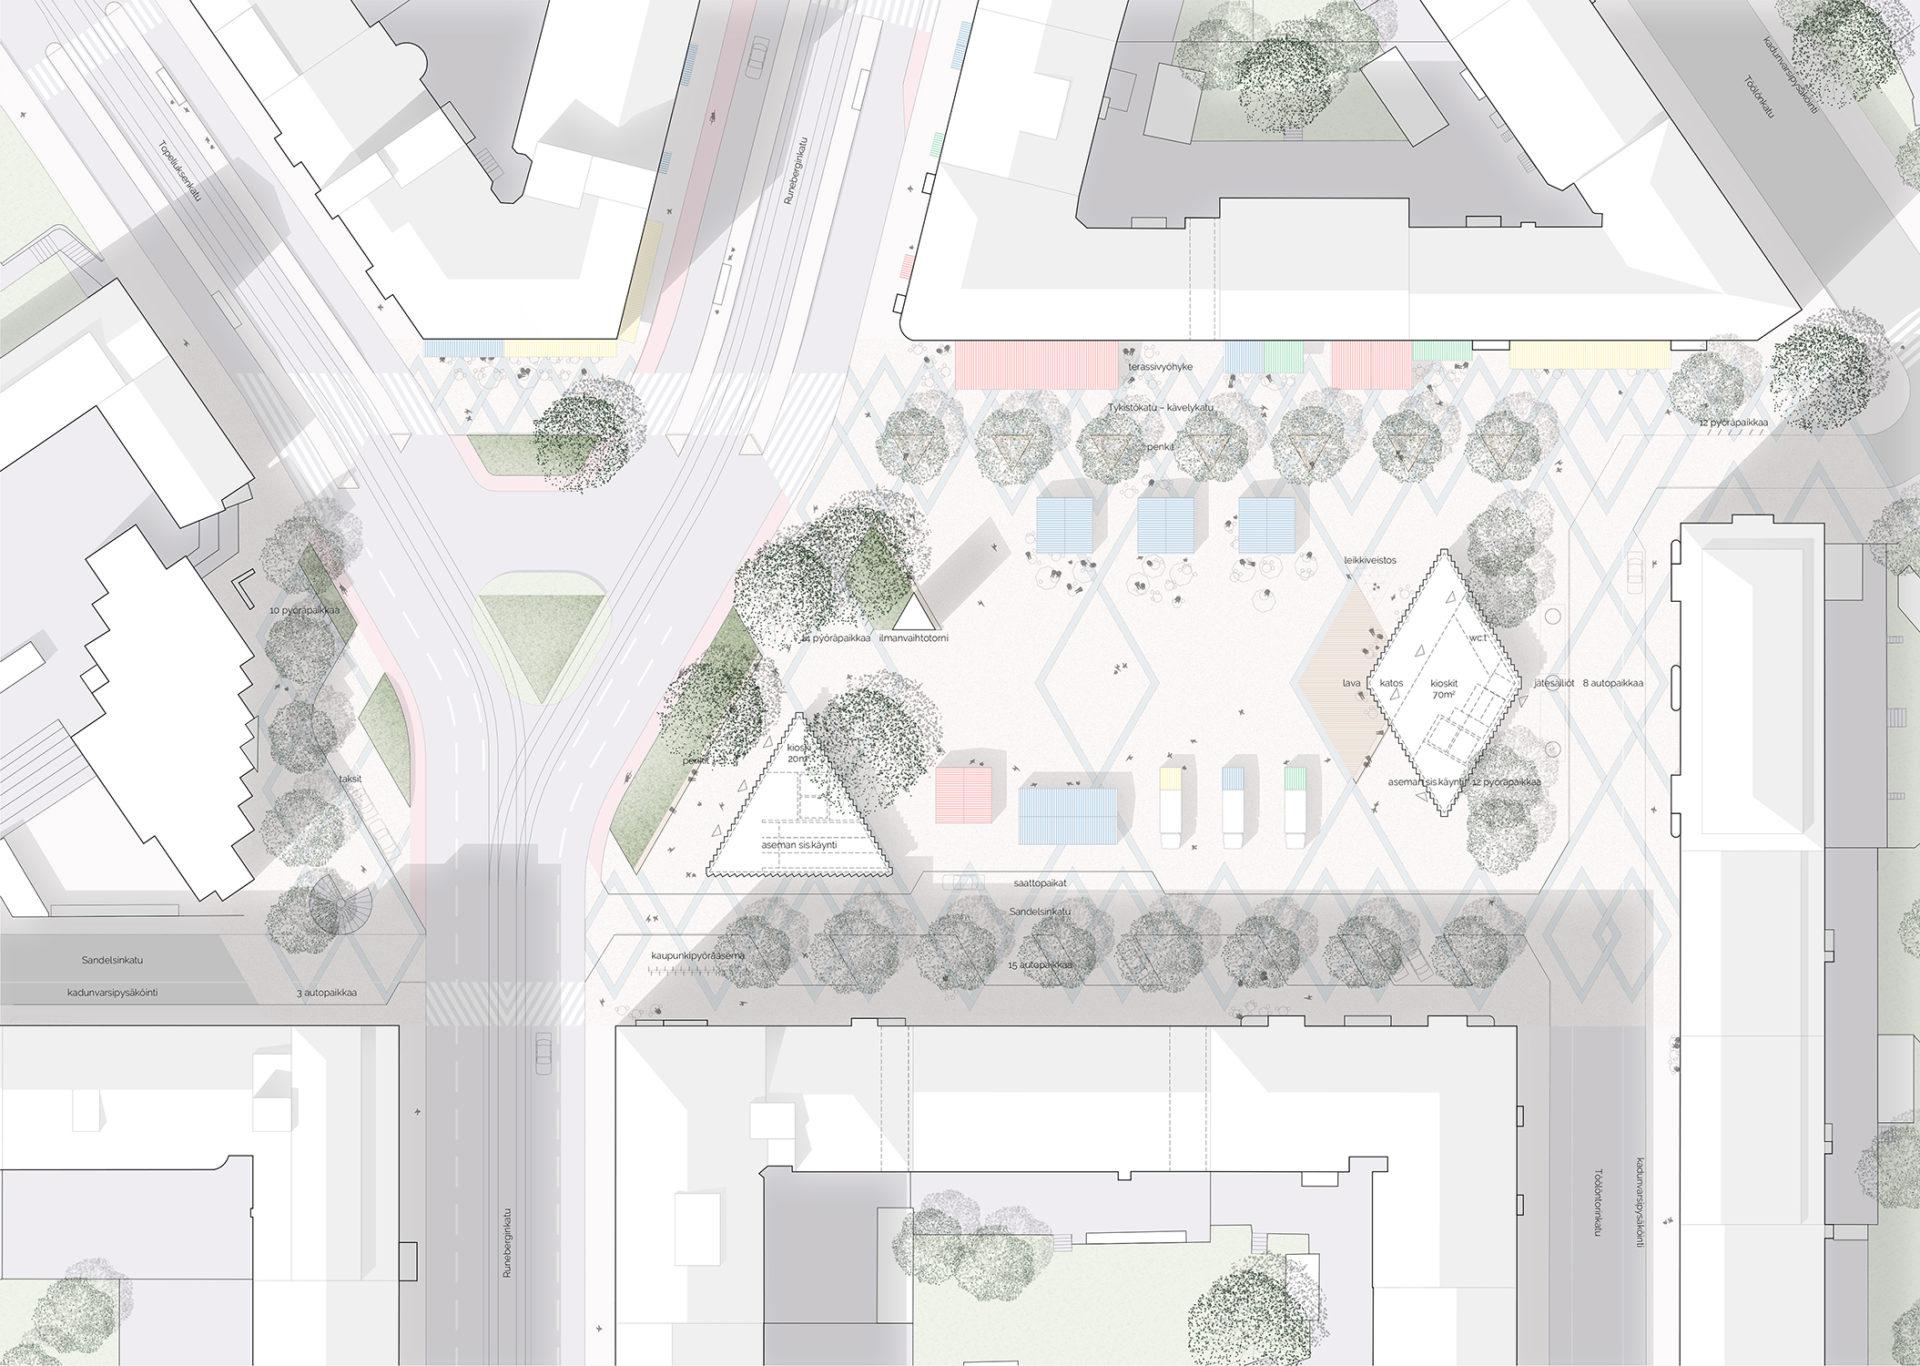 Töölöntorin ideakilpailu asemapiirros competition site plan of the redesigned square